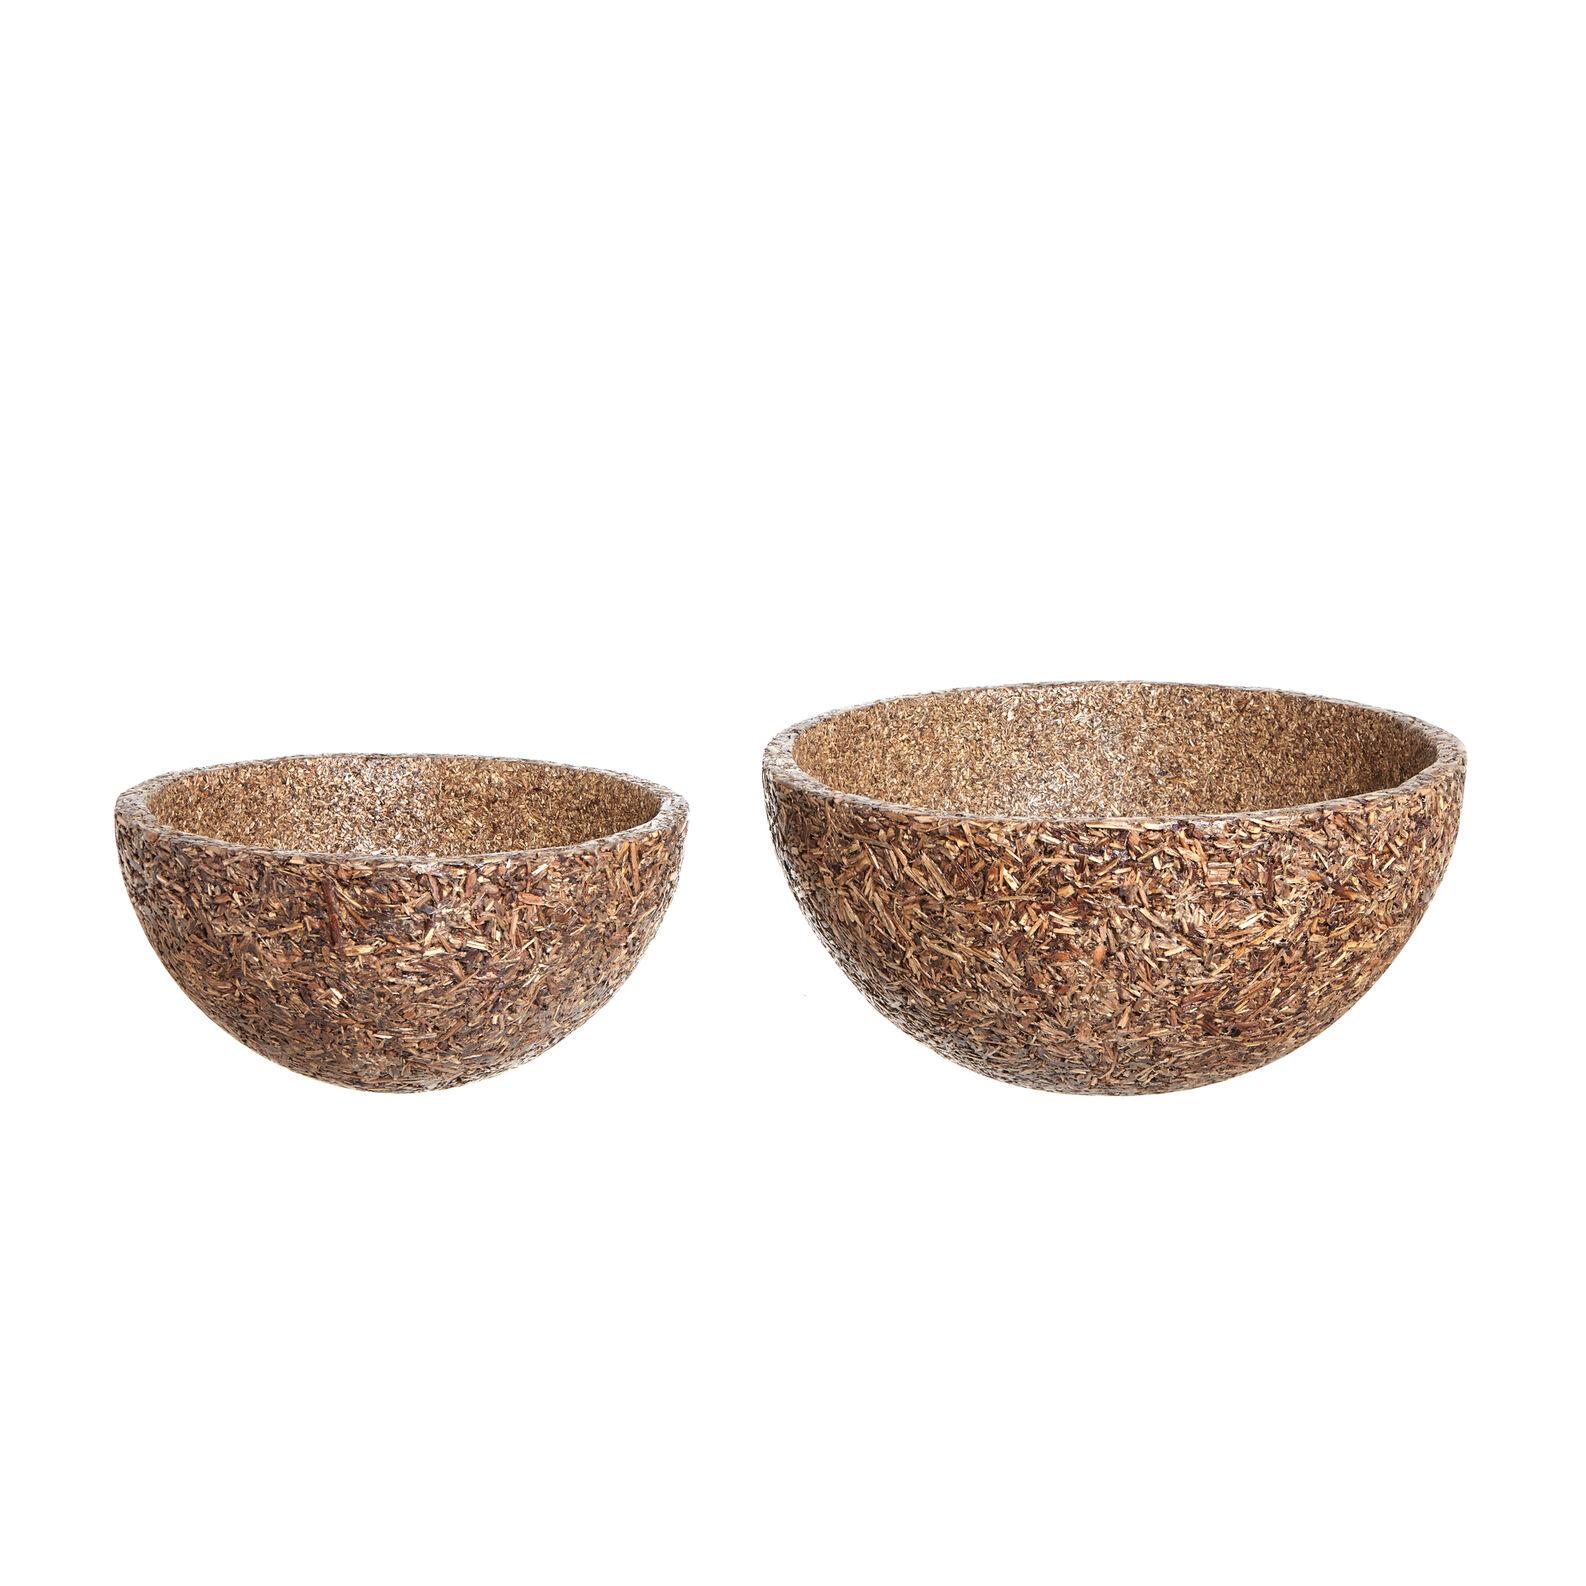 Decorative bowl in agroforestry debris